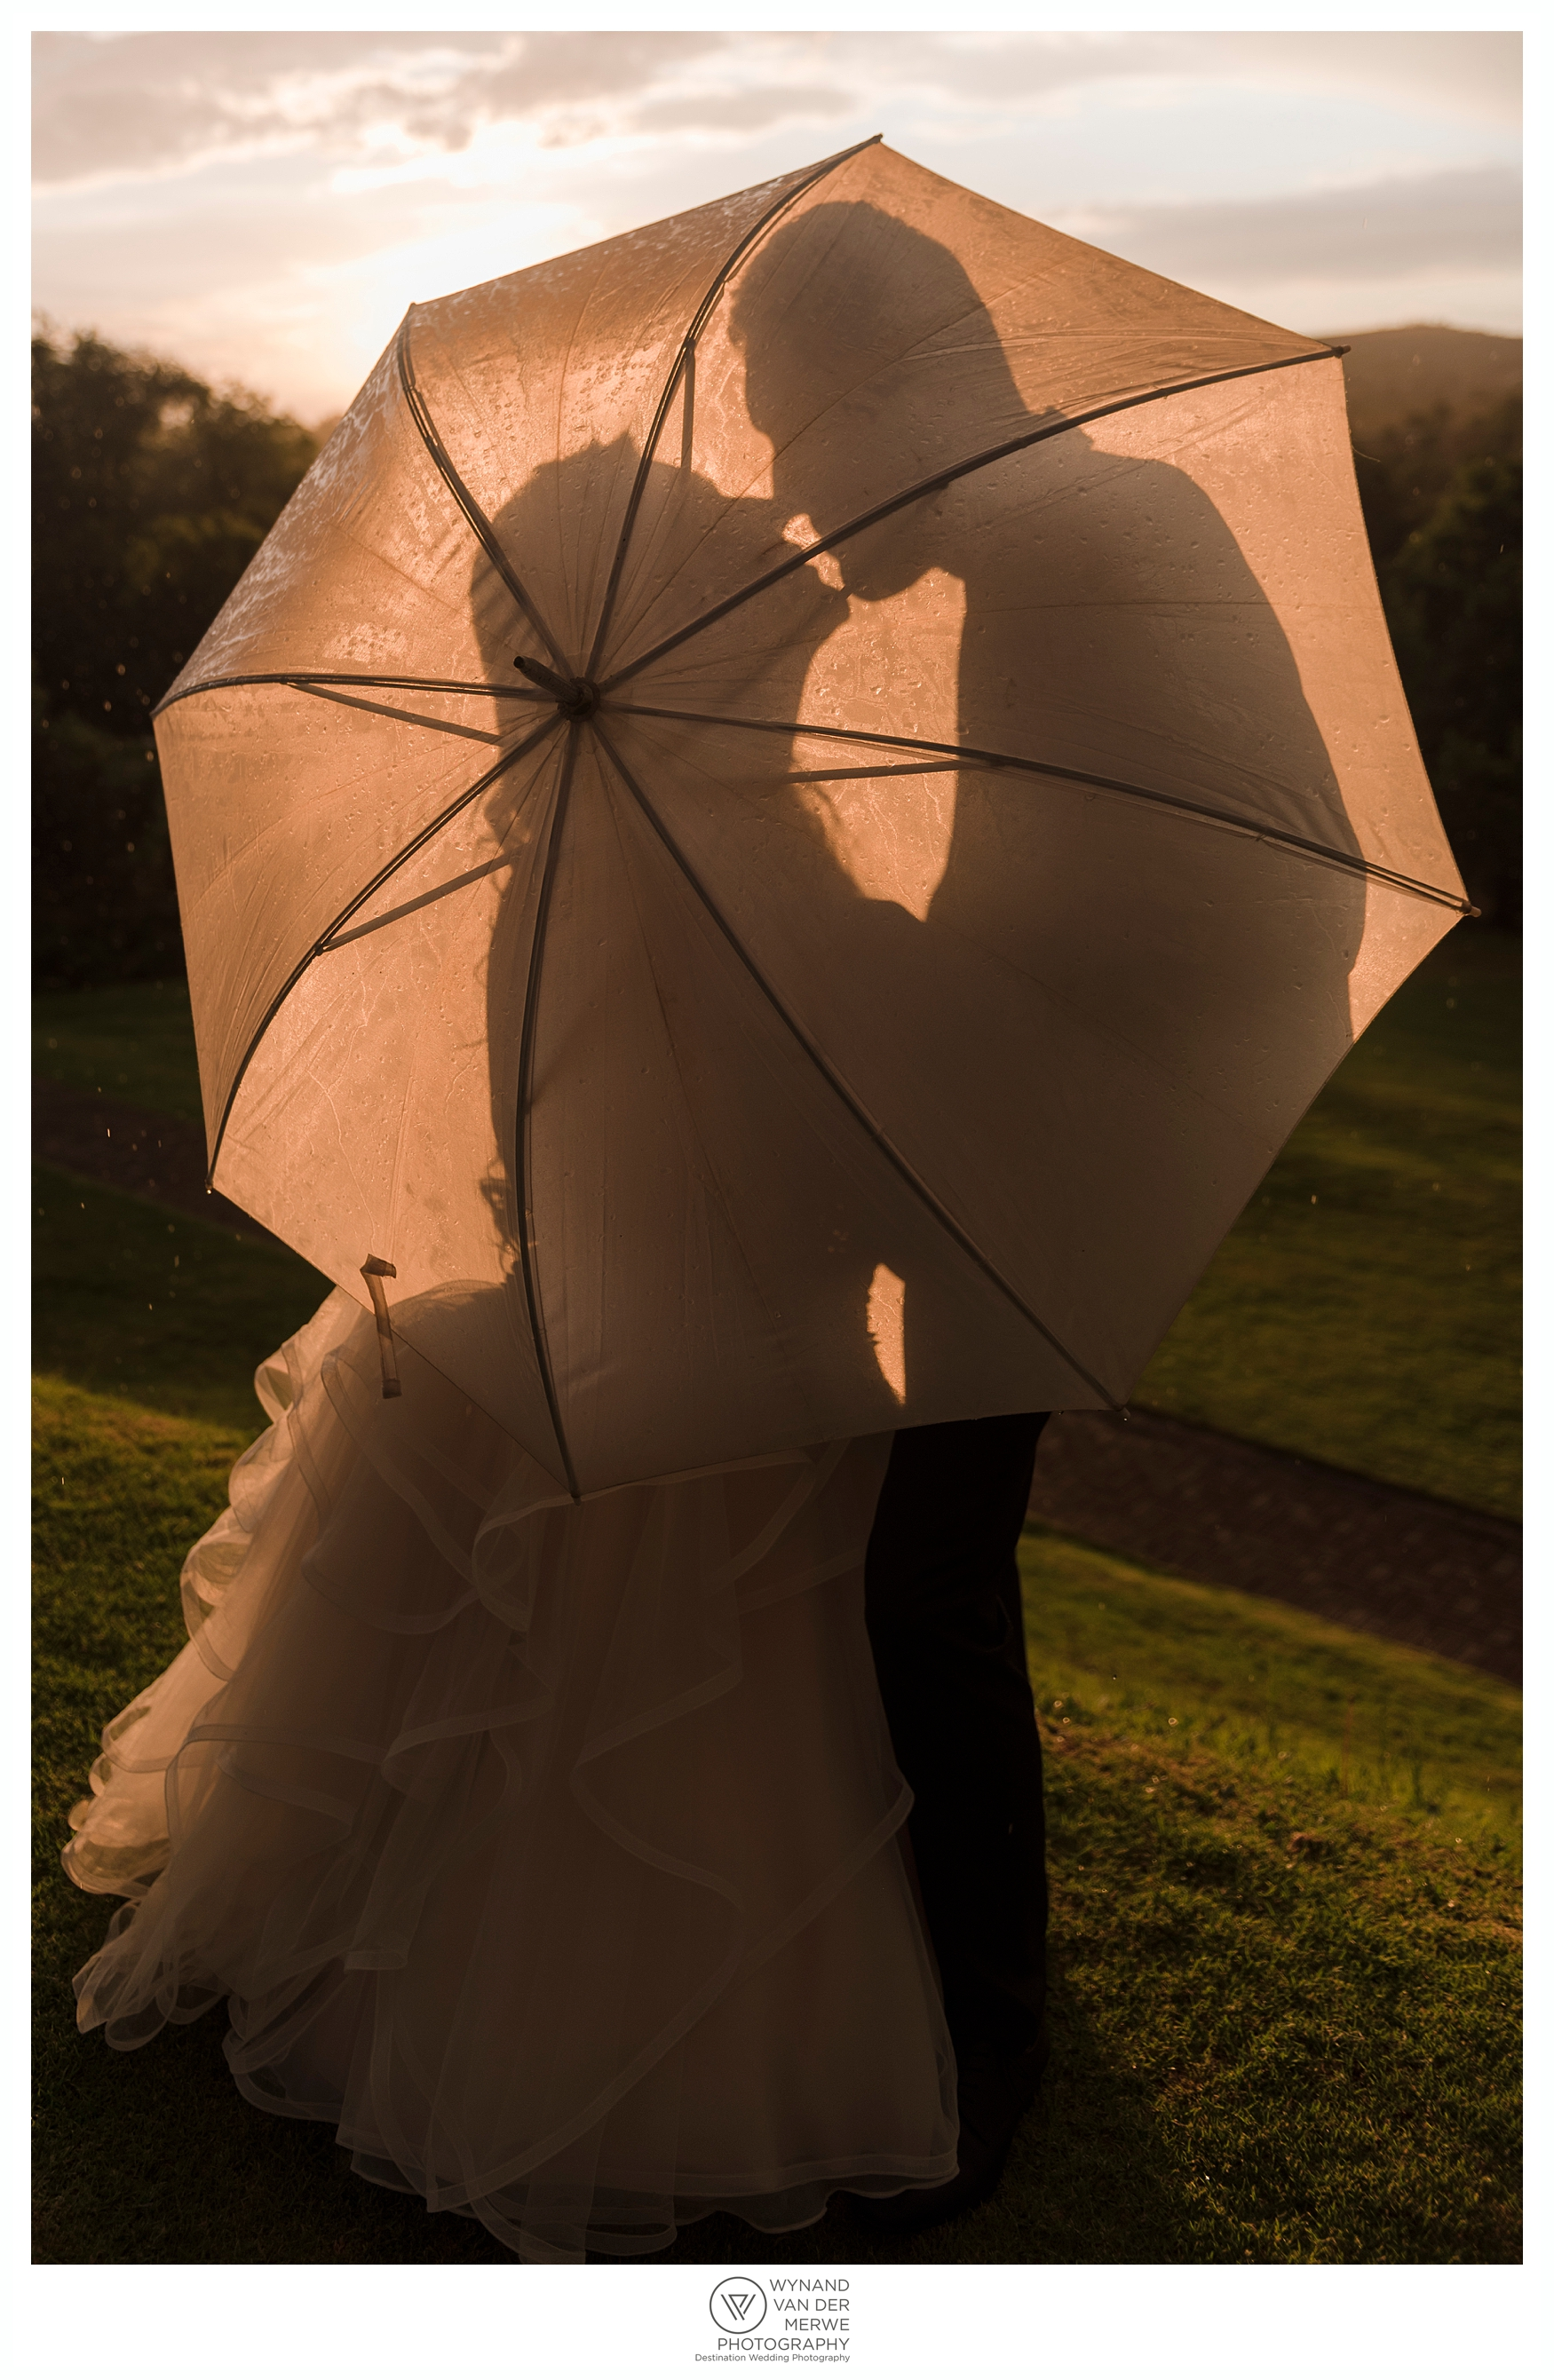 Wynandvandermerwe ryan natalia wedding photography cradle valley guesthouse gauteng-494.jpg